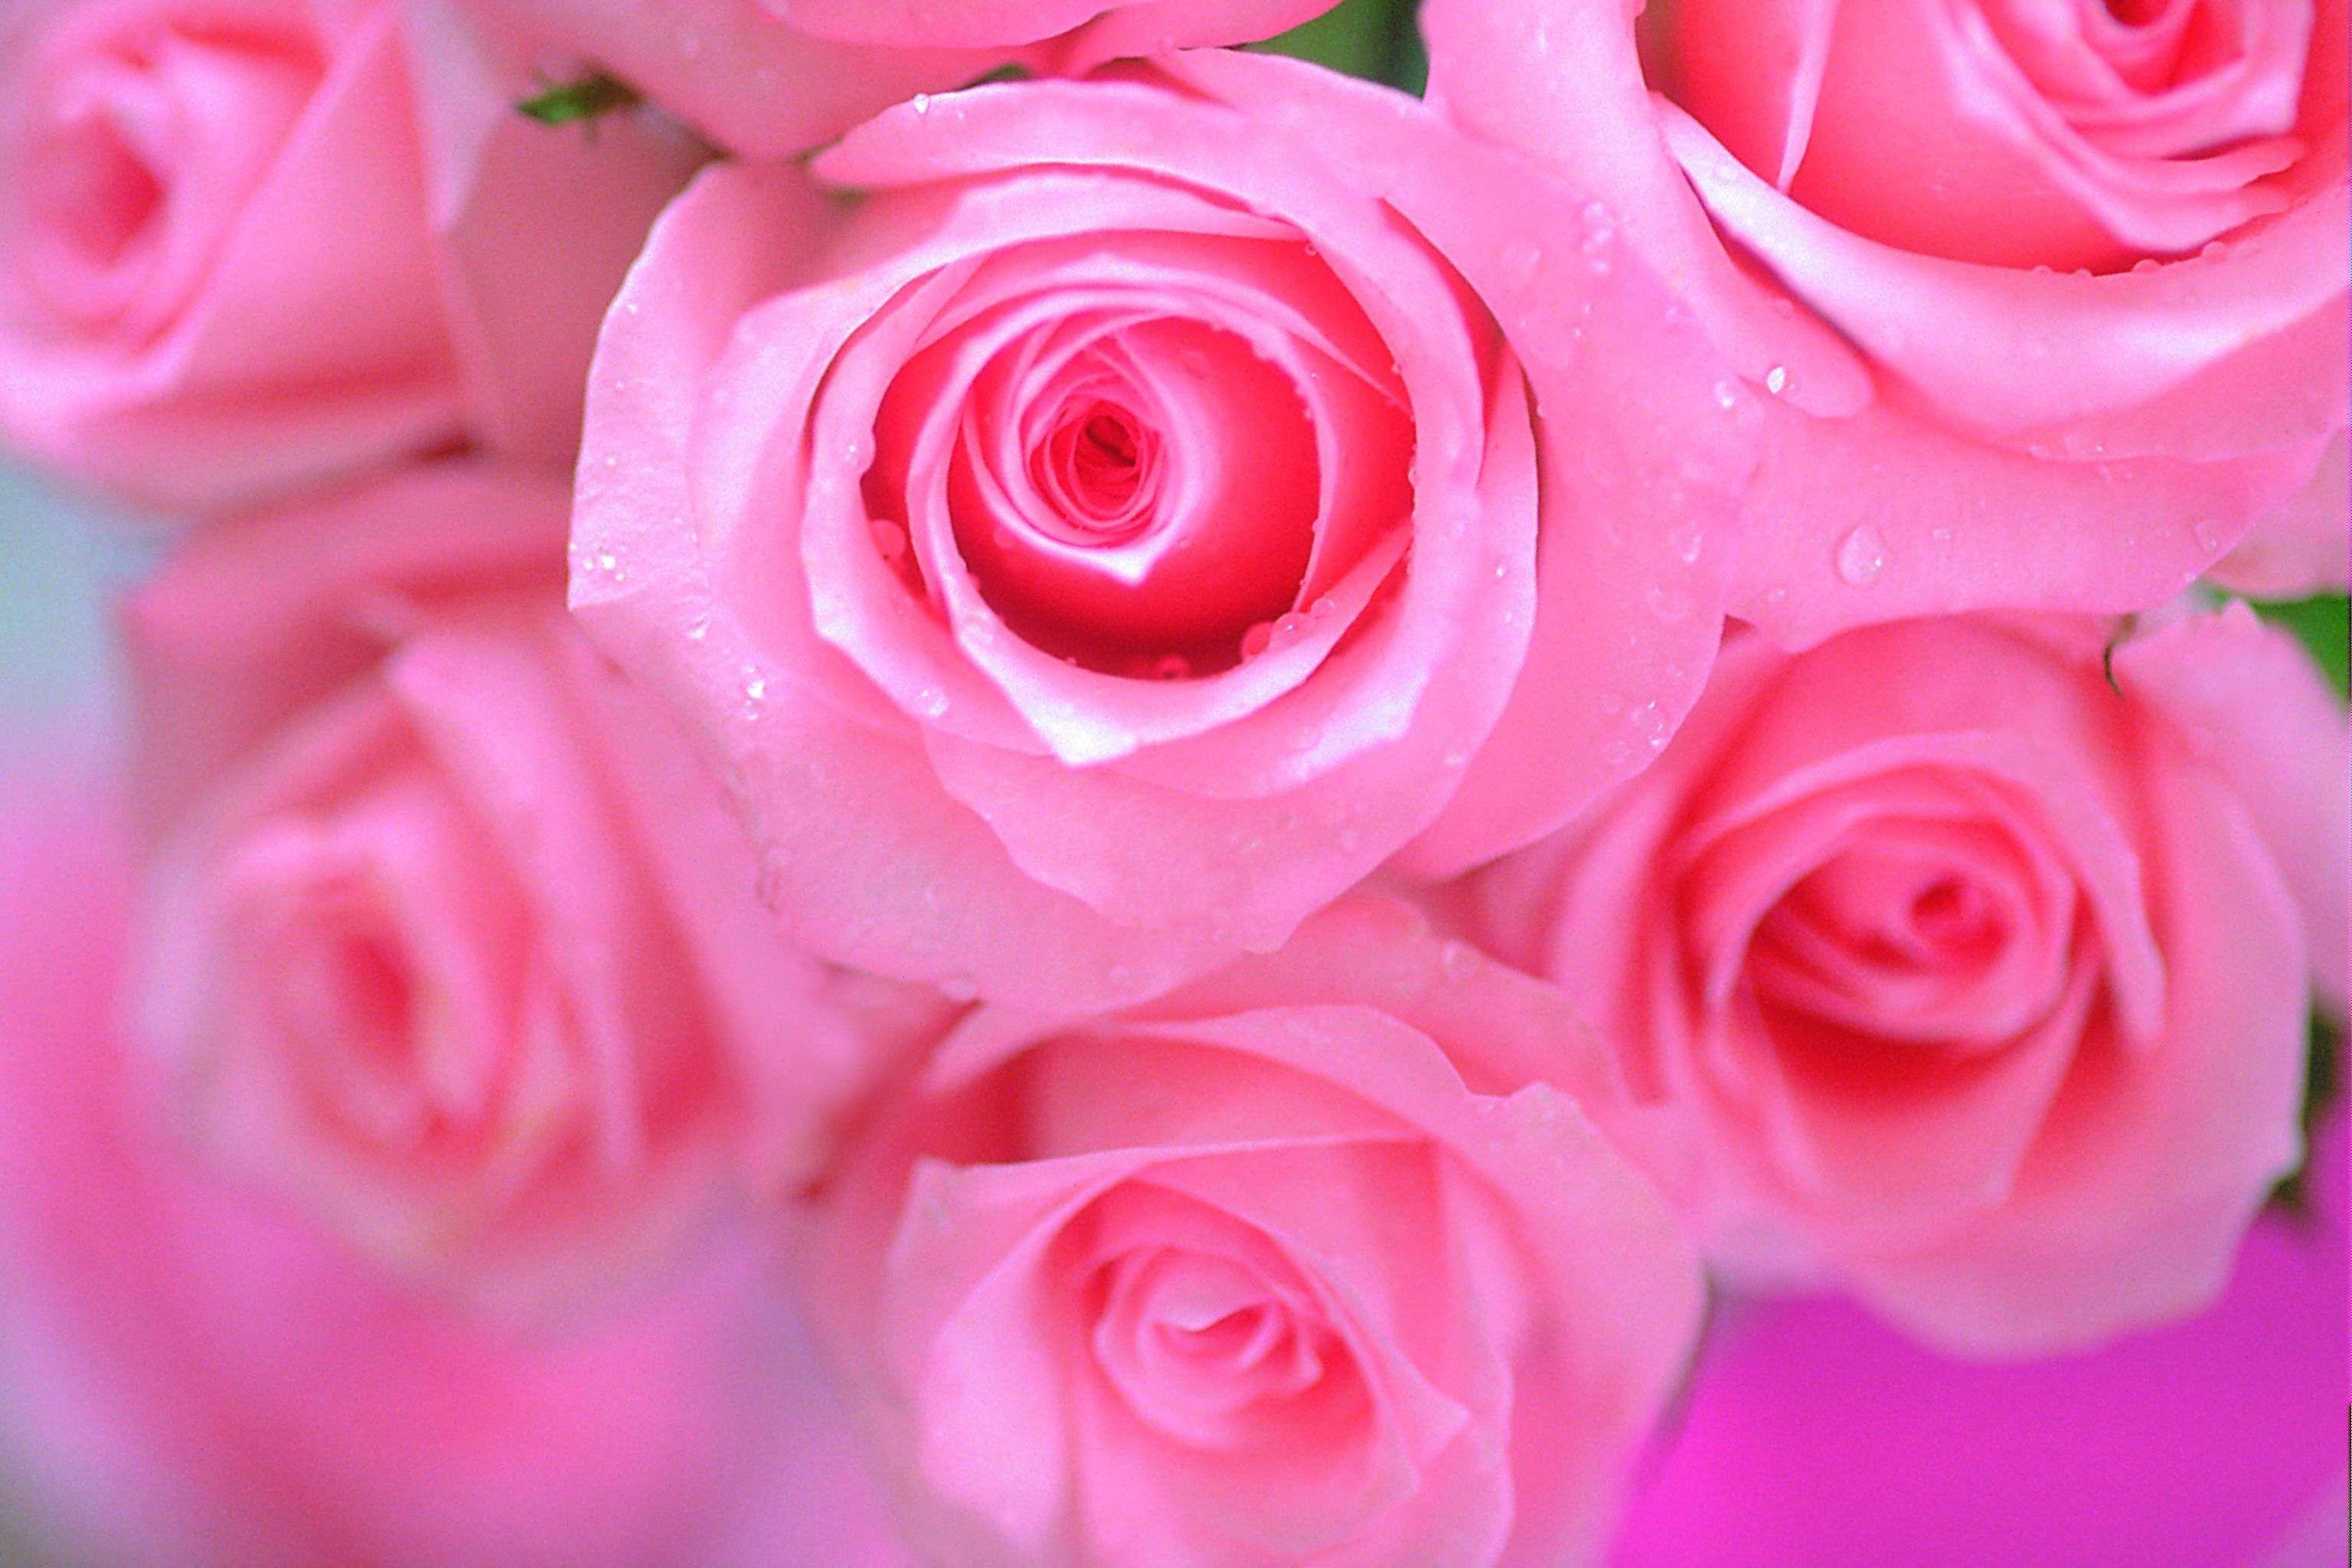 Res 3072x2048 Pink Rose Wallpaper Beautiful Pink Rose Flowers